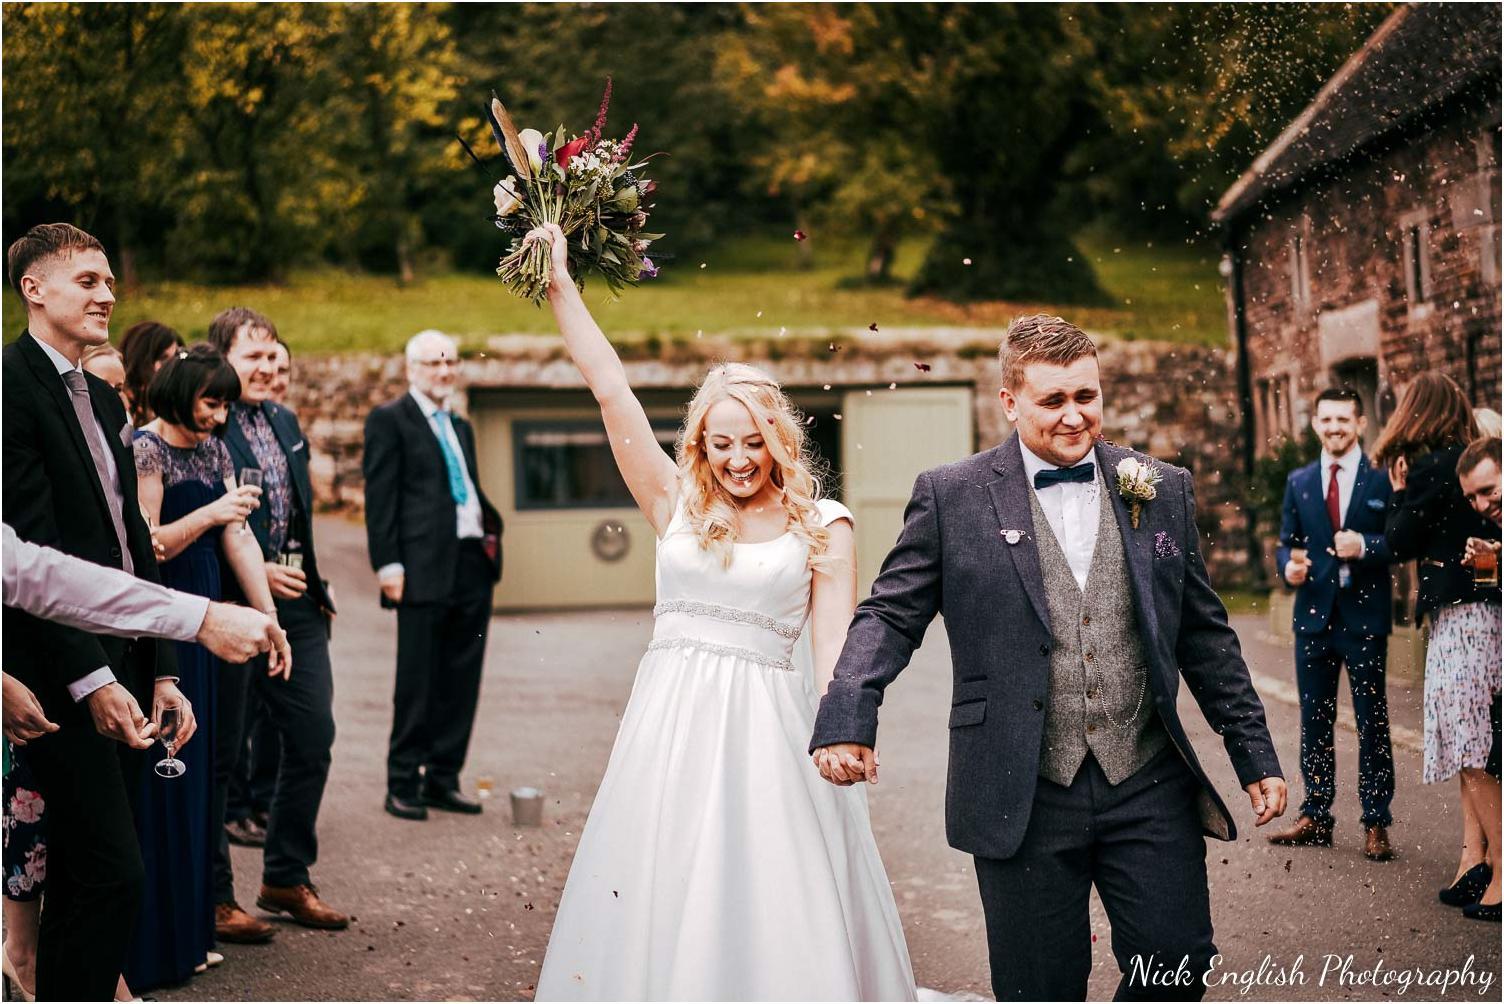 The_Ashes_Barn_Endon_Stoke_Wedding_Photographer-56.jpg